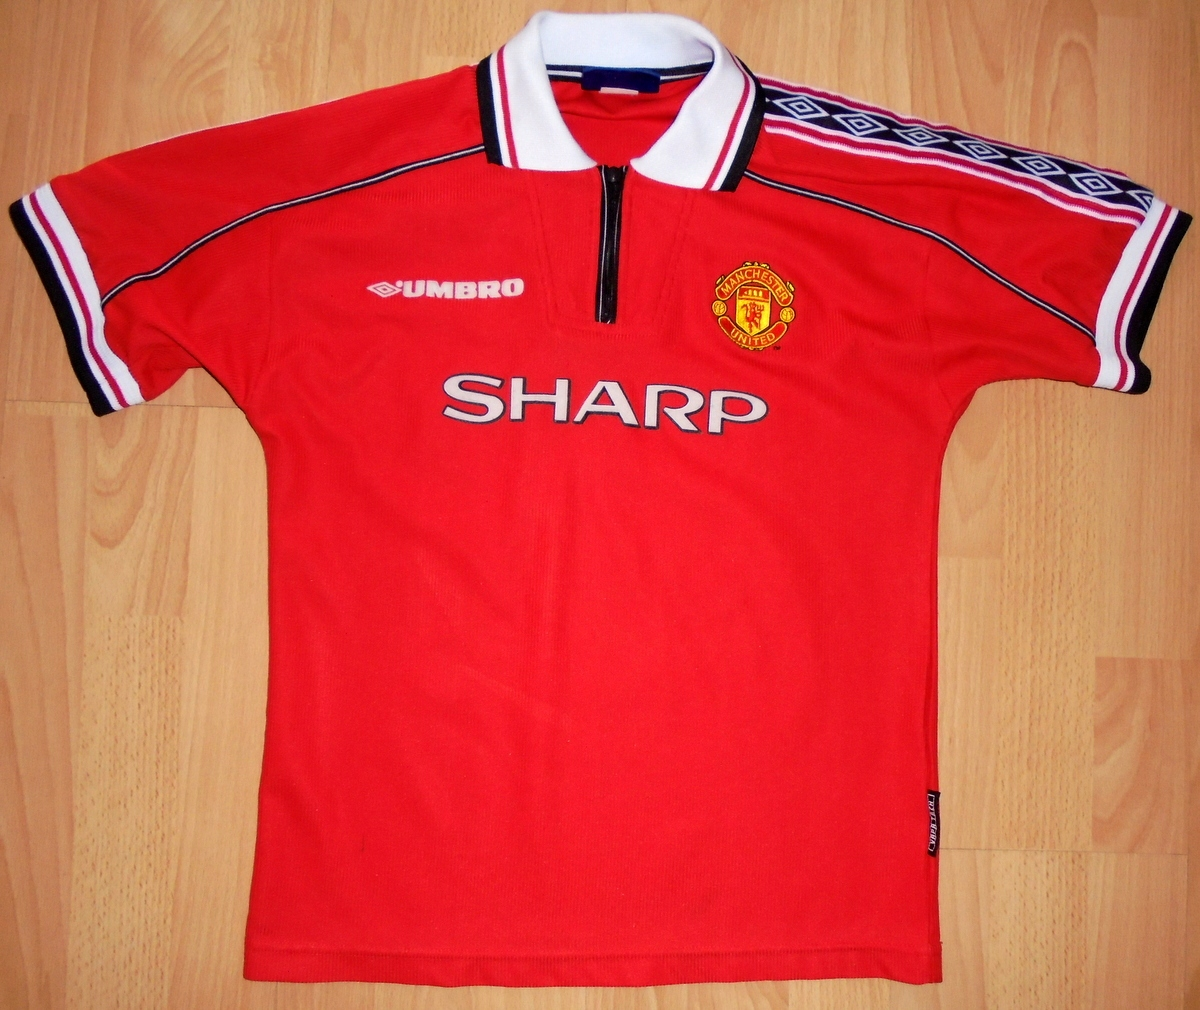 Koszulka Manchester United Umbro 1998/200 retro